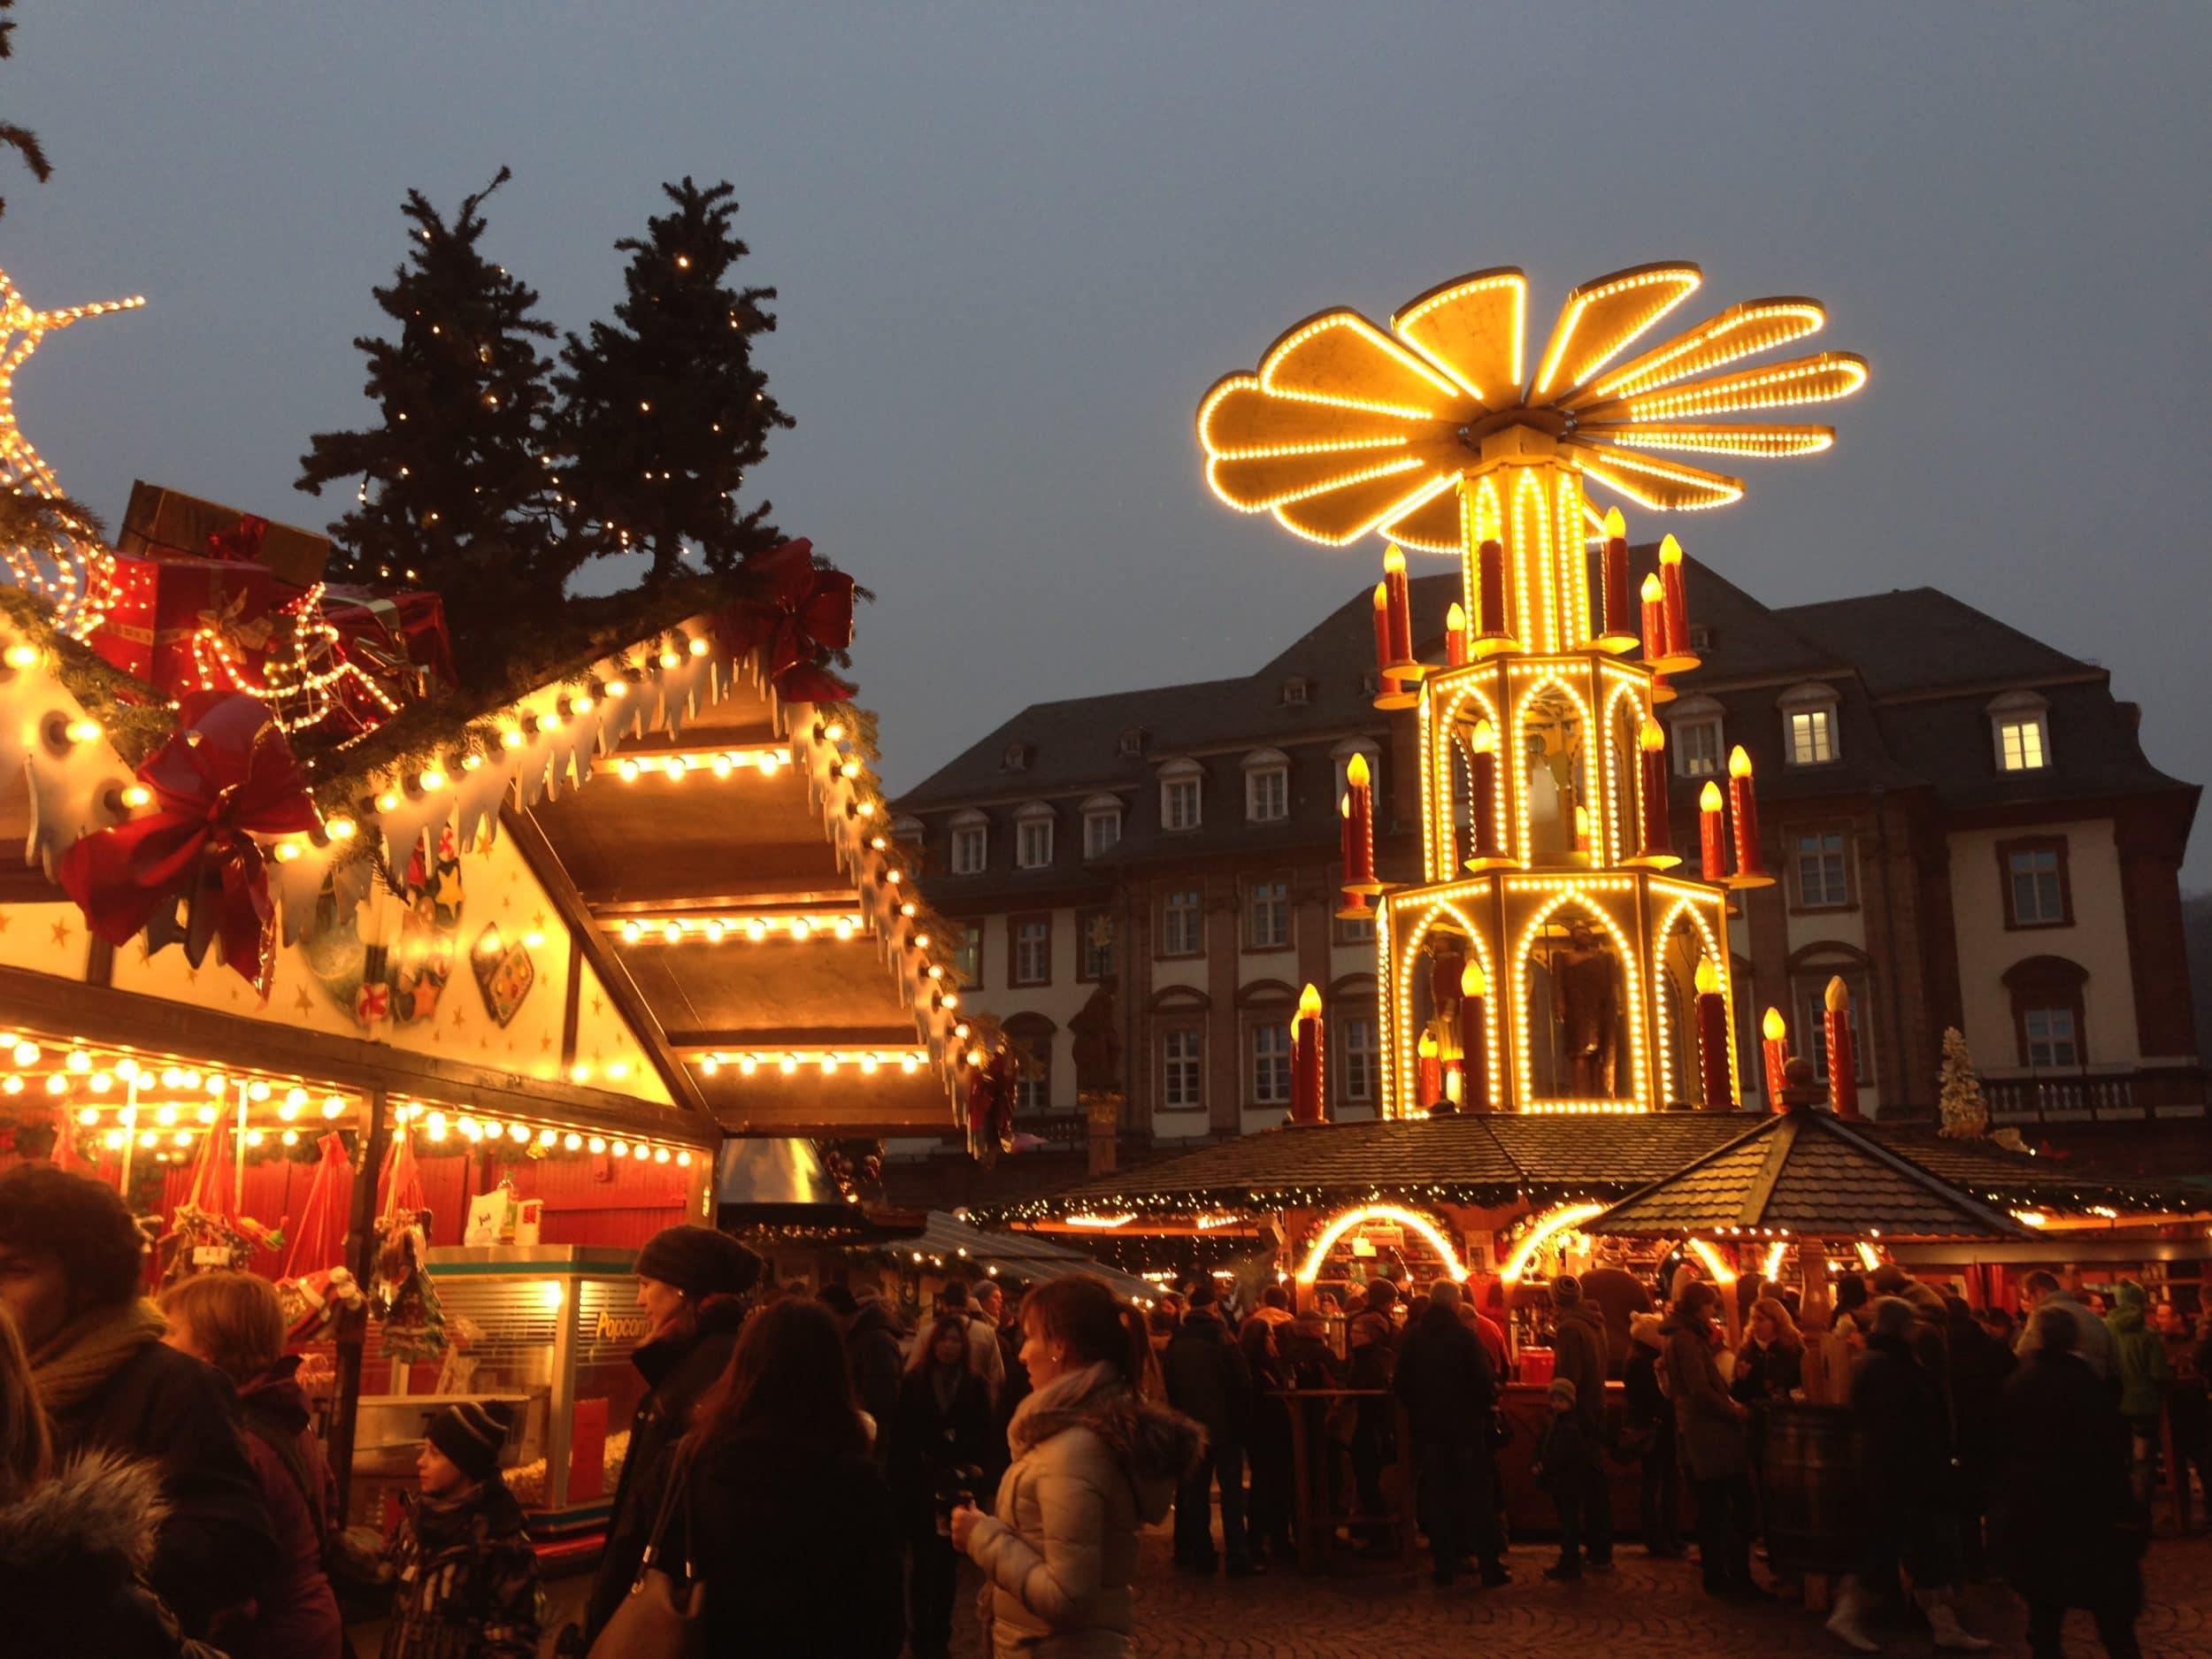 Heidelberg Christmas Market via Wayfaring With Wagner